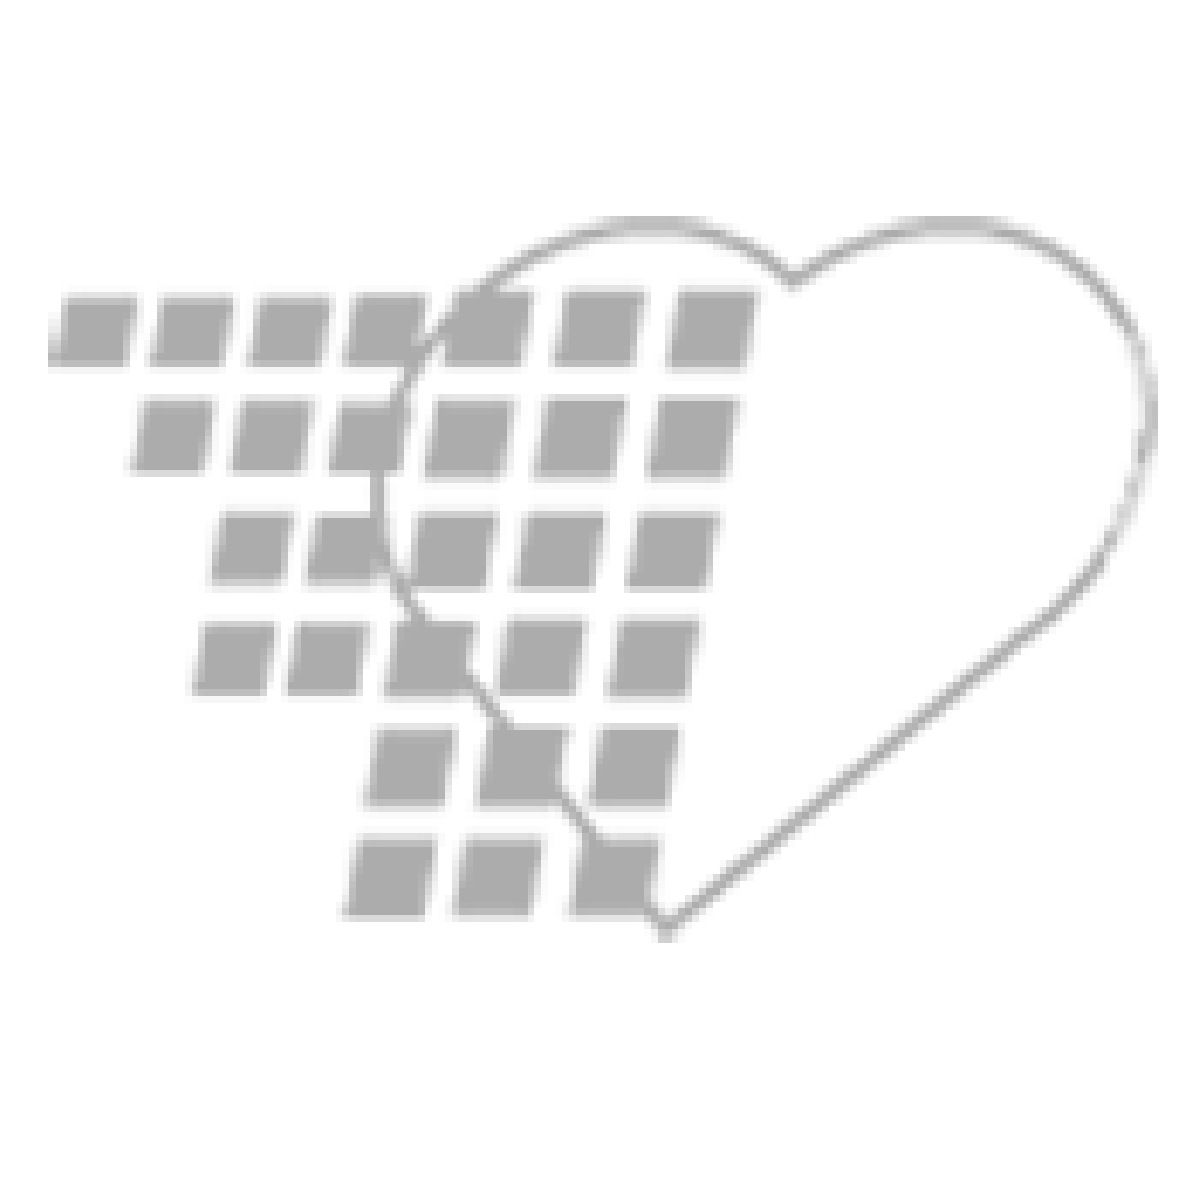 "06-26-2519 - B.Braun Introcan Safety IV Catheter - 22g x 1"" Straight"